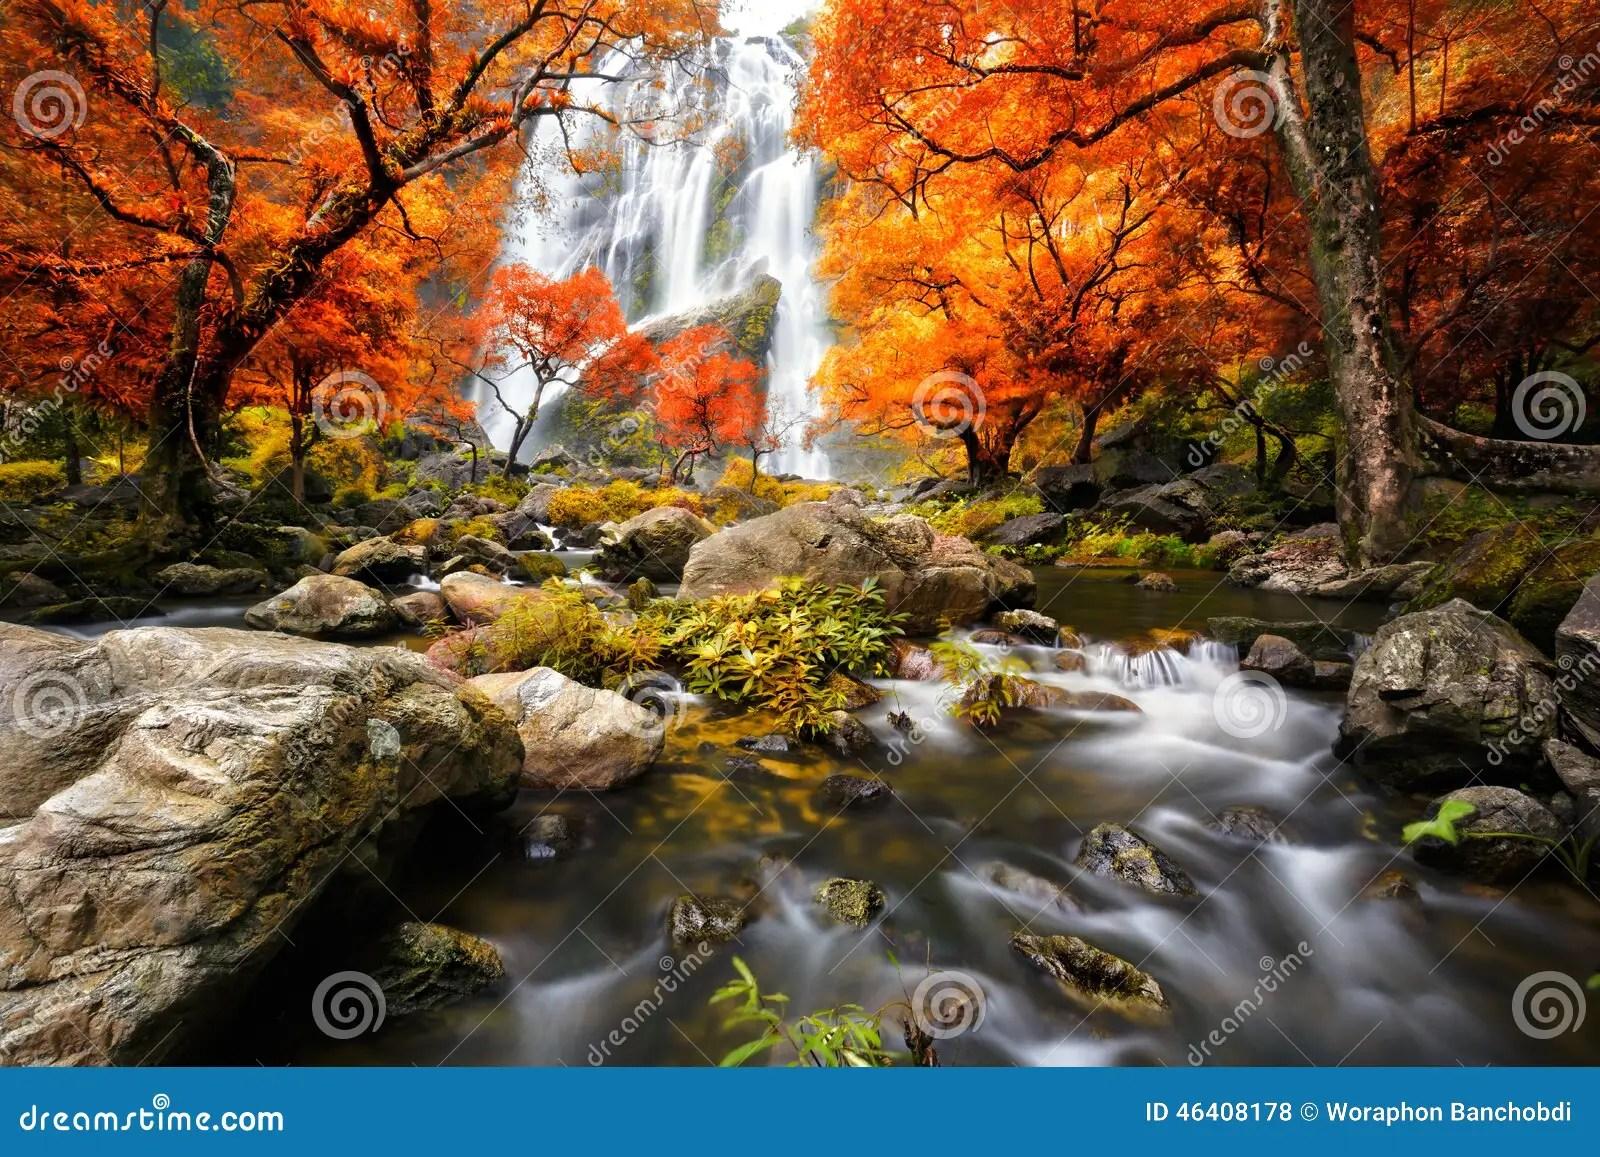 Tahquamenon Falls Michigan Winter Wallpaper Waterfall In The Autumn Stock Photo Image Of Green